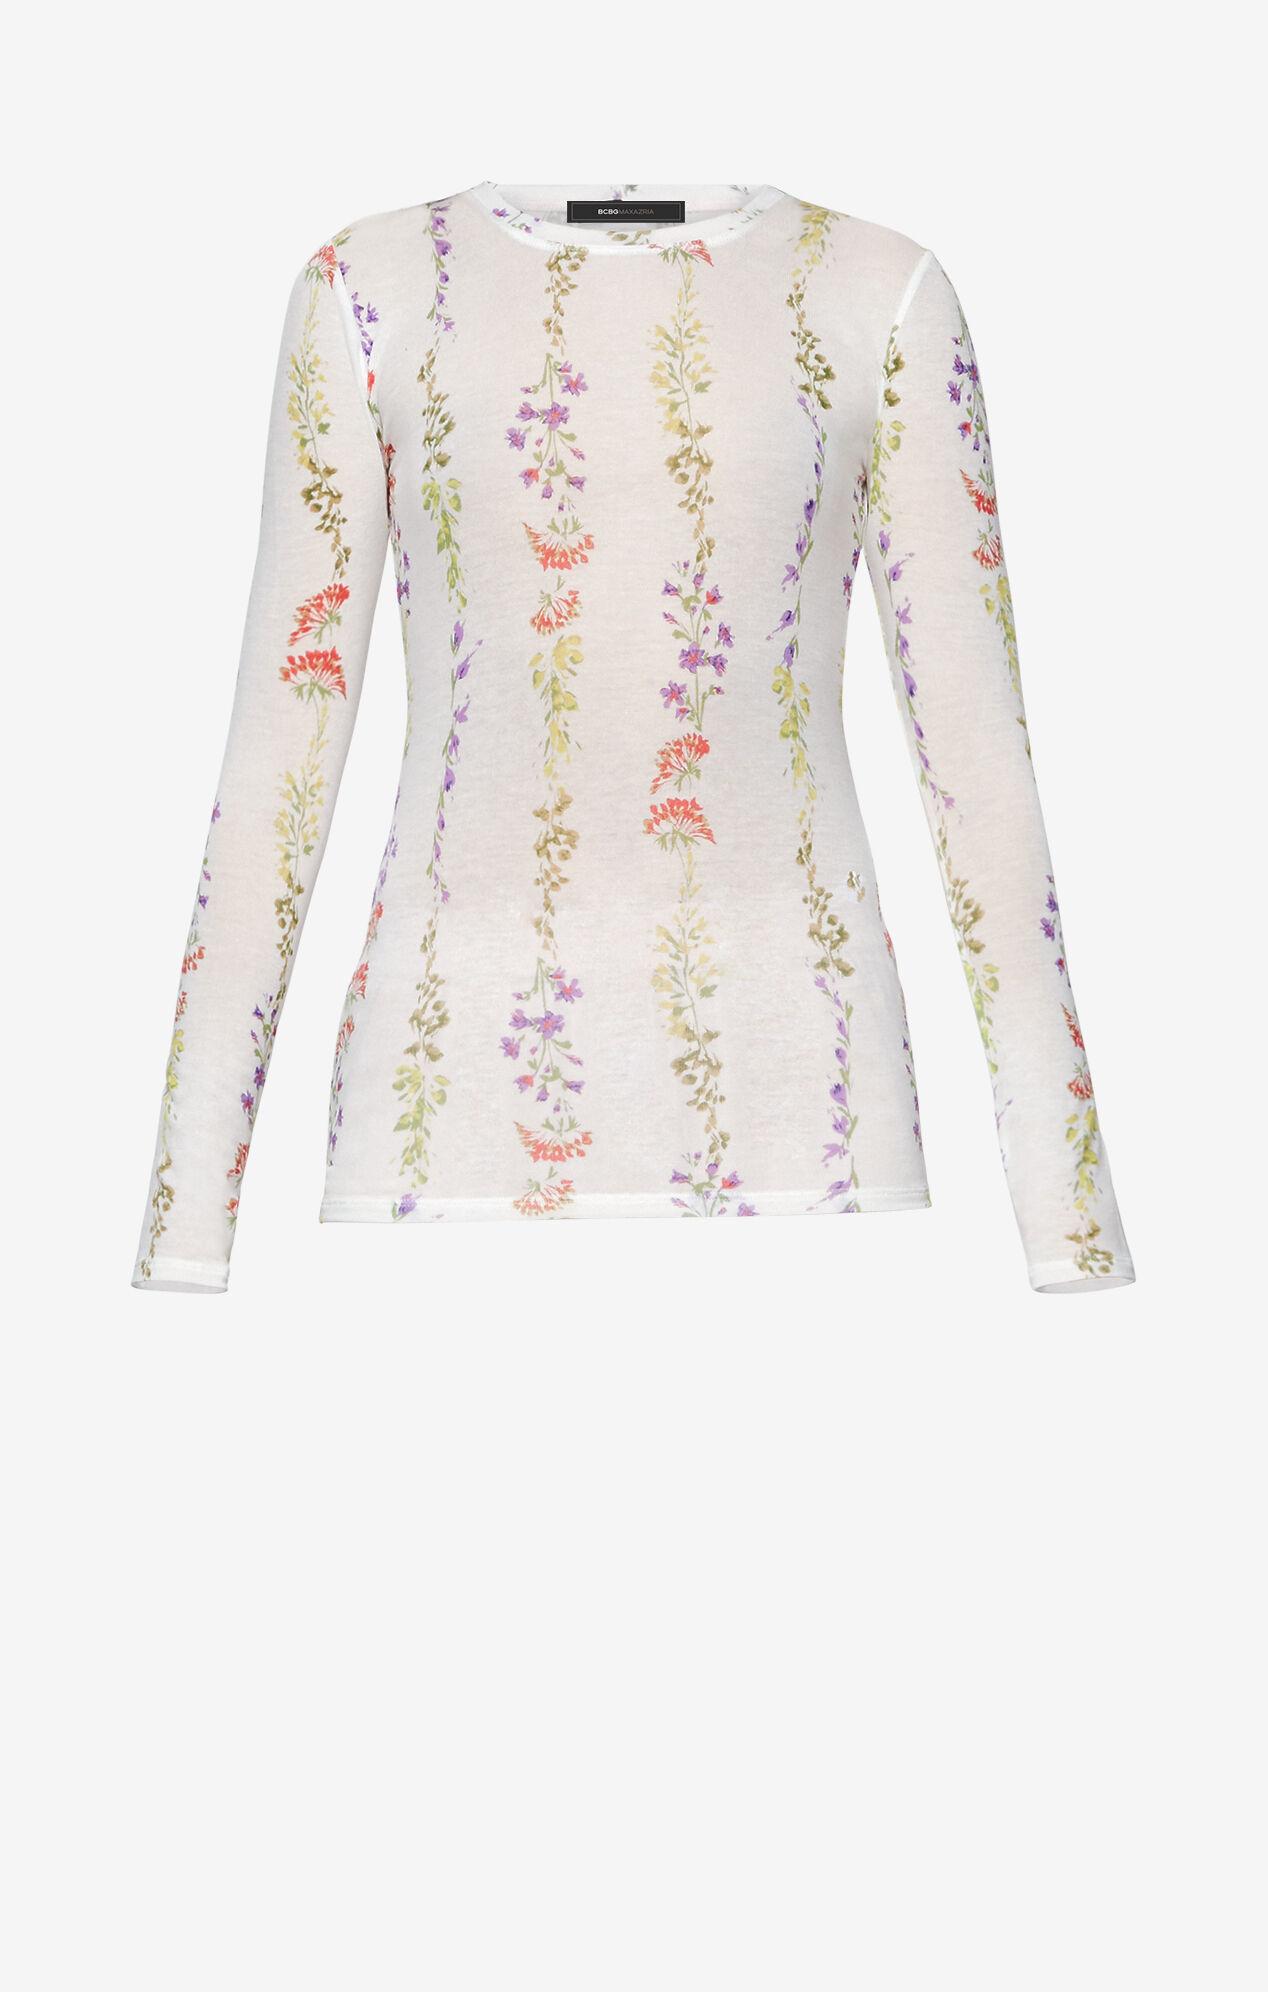 Agda Floral-Print Top